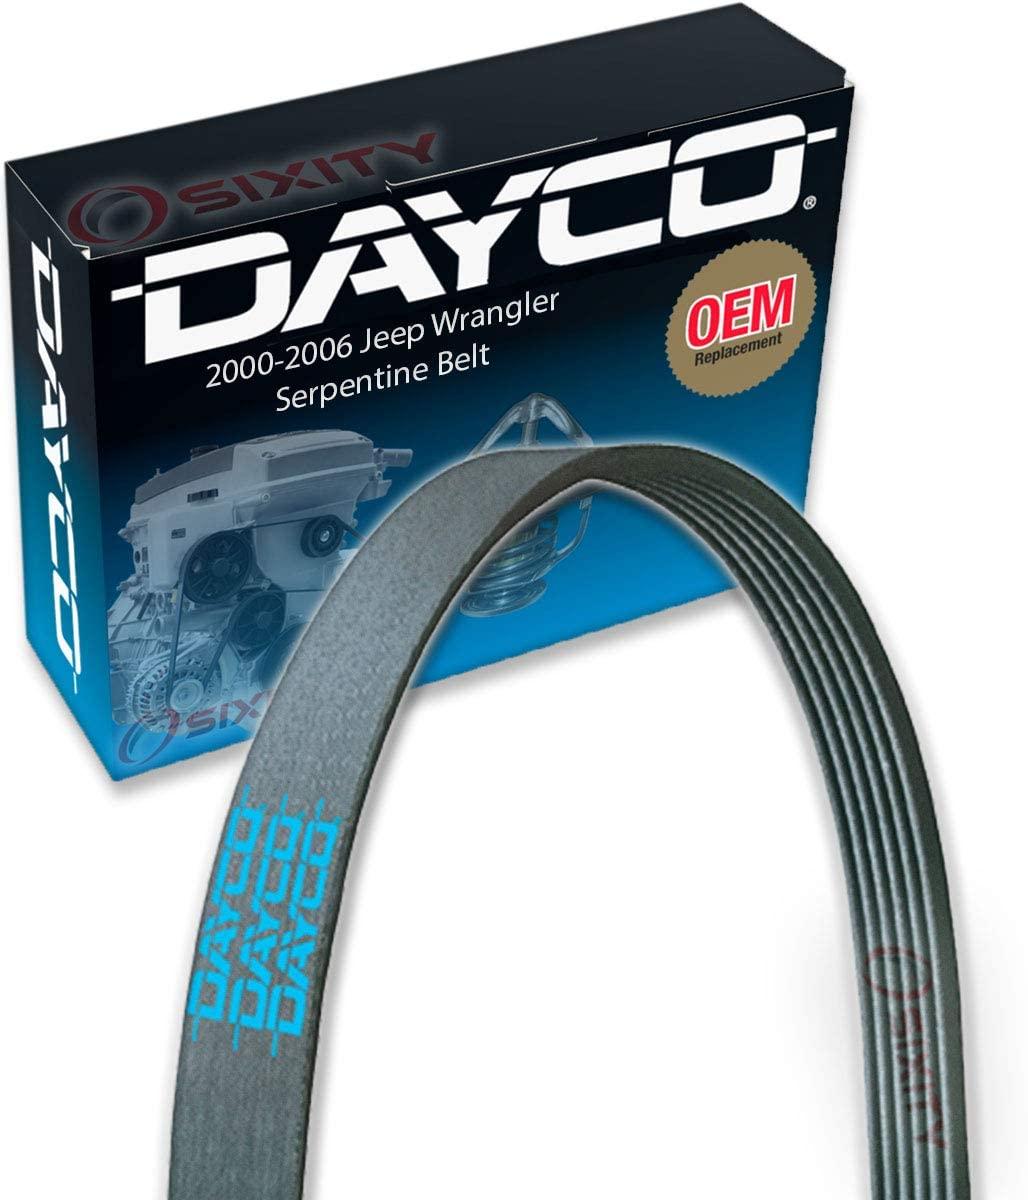 Dayco Serpentine Belt for 2000-2006 Jeep Wrangler 4.0L L6 - V Belt Ribbed Accessory Drive